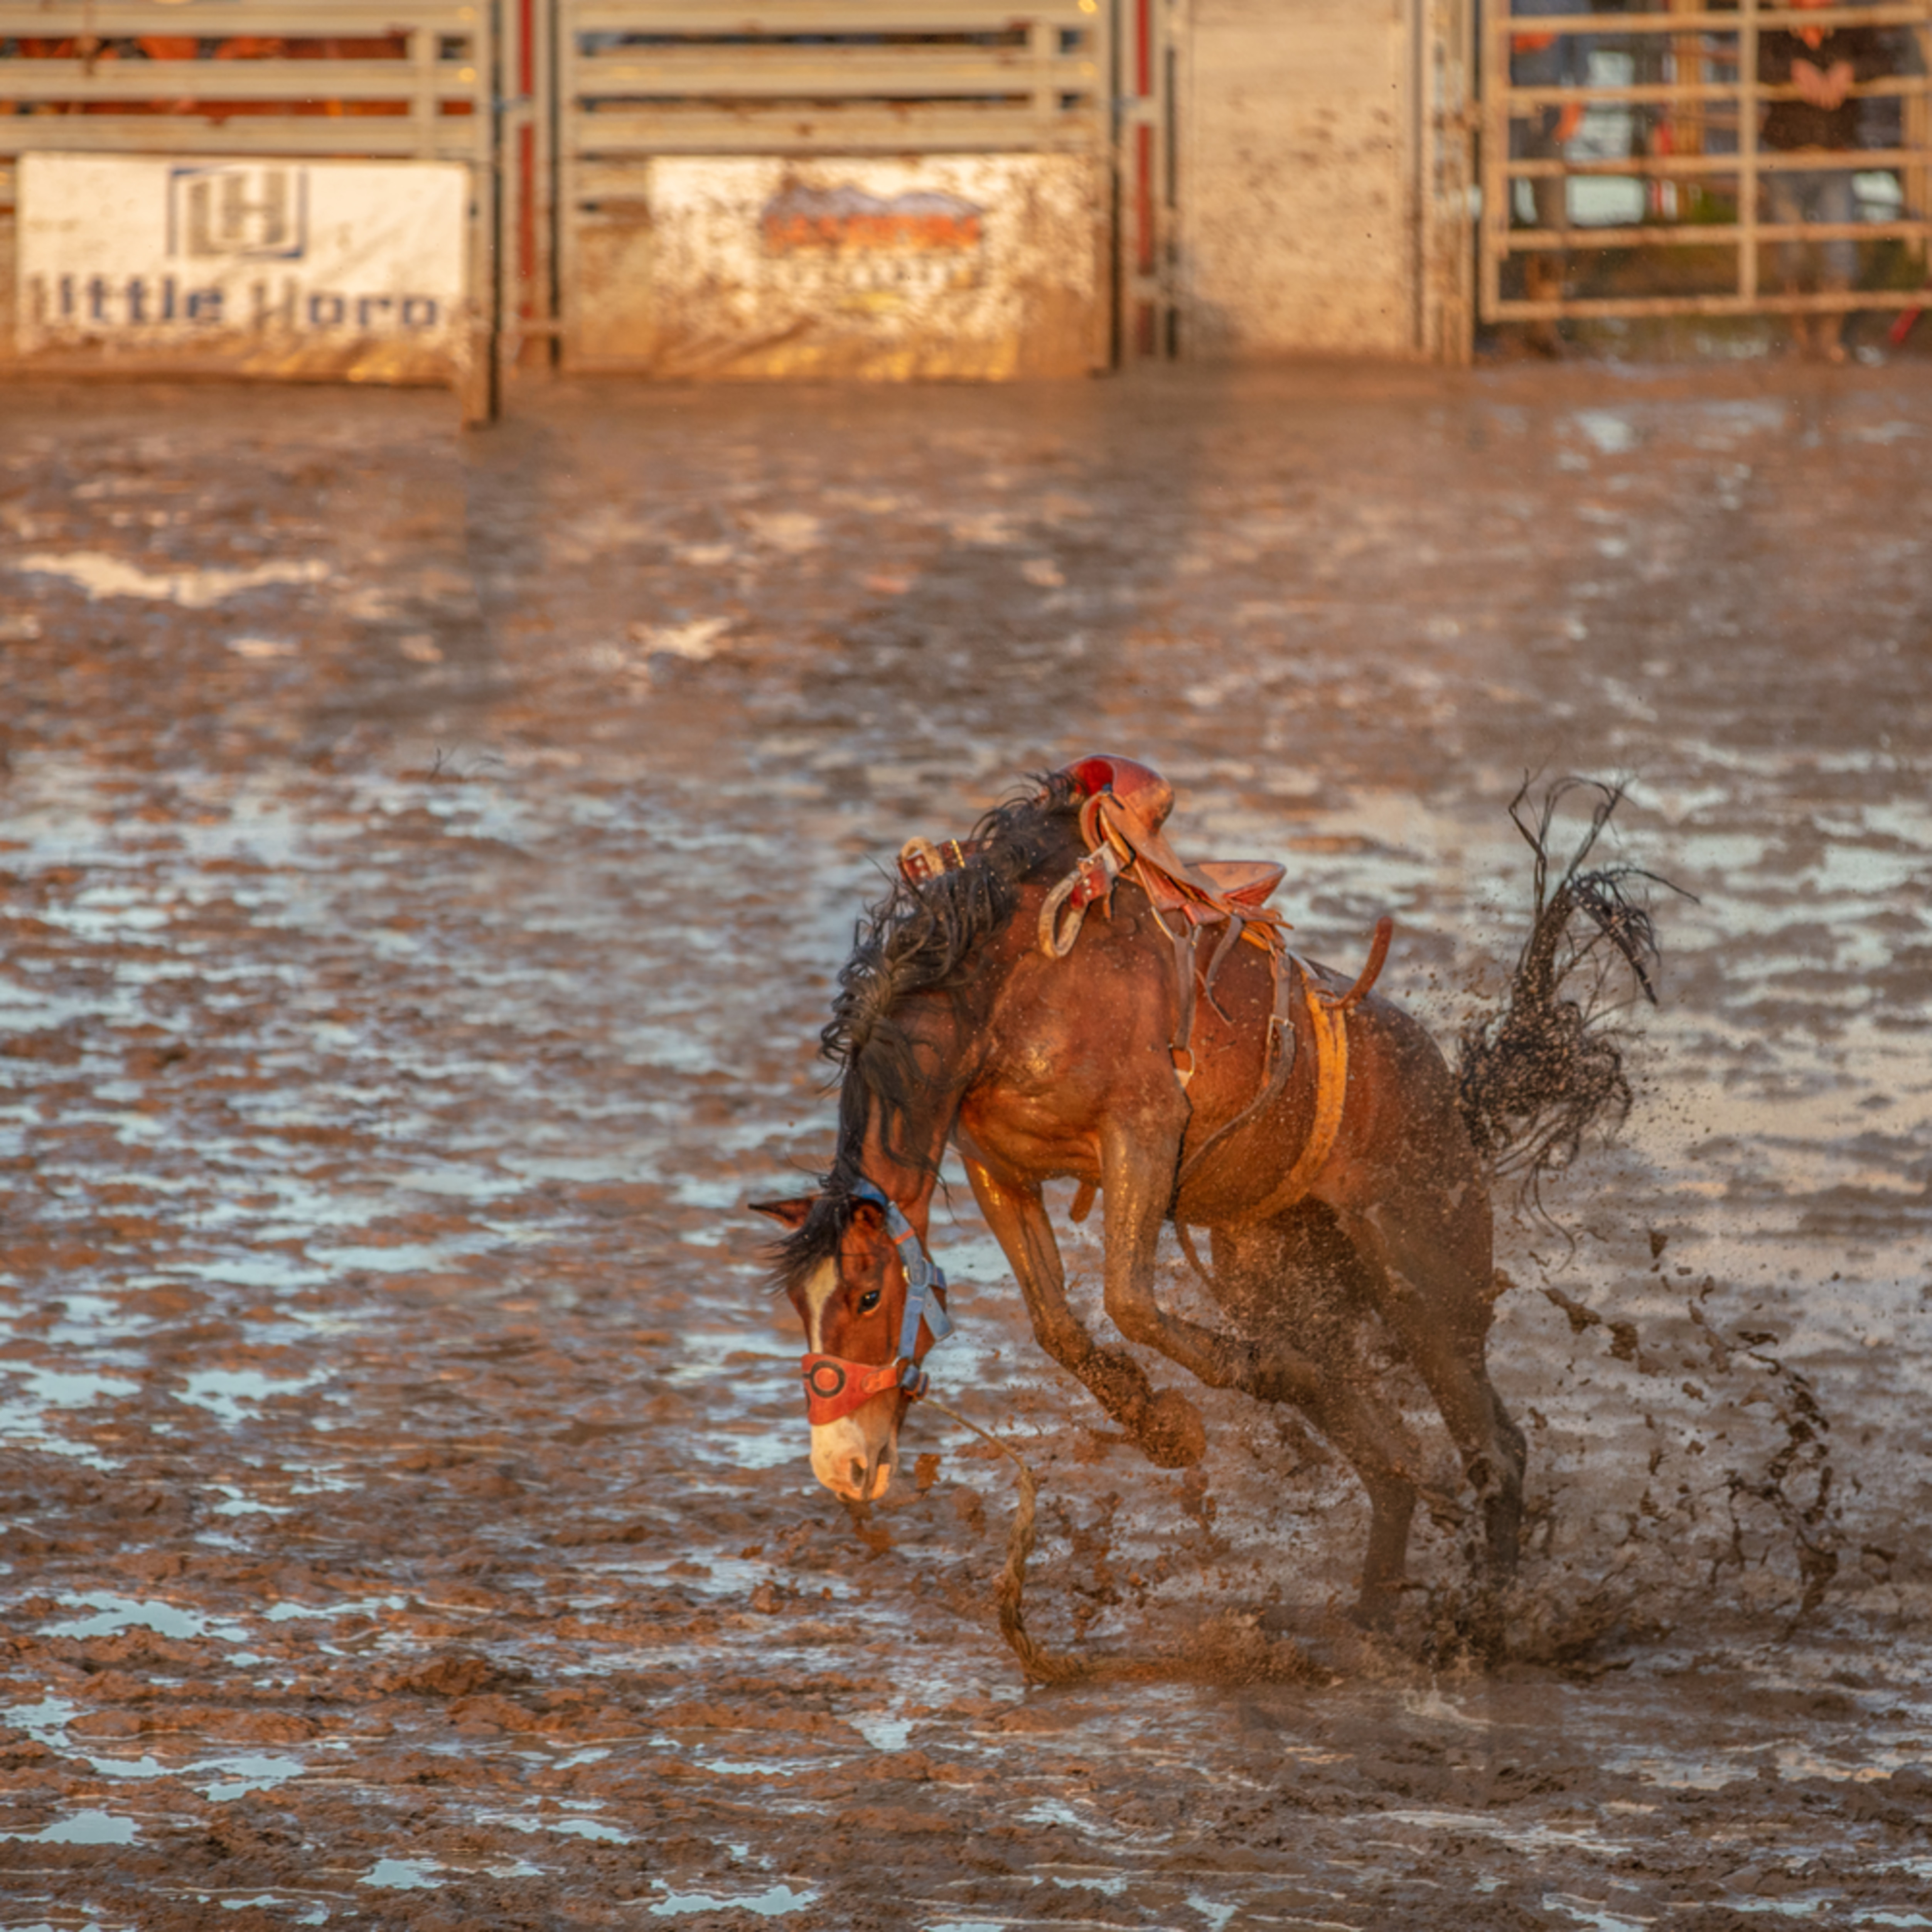 Broncs 1 cowboys 0 weather slight chance of rain apsbkn